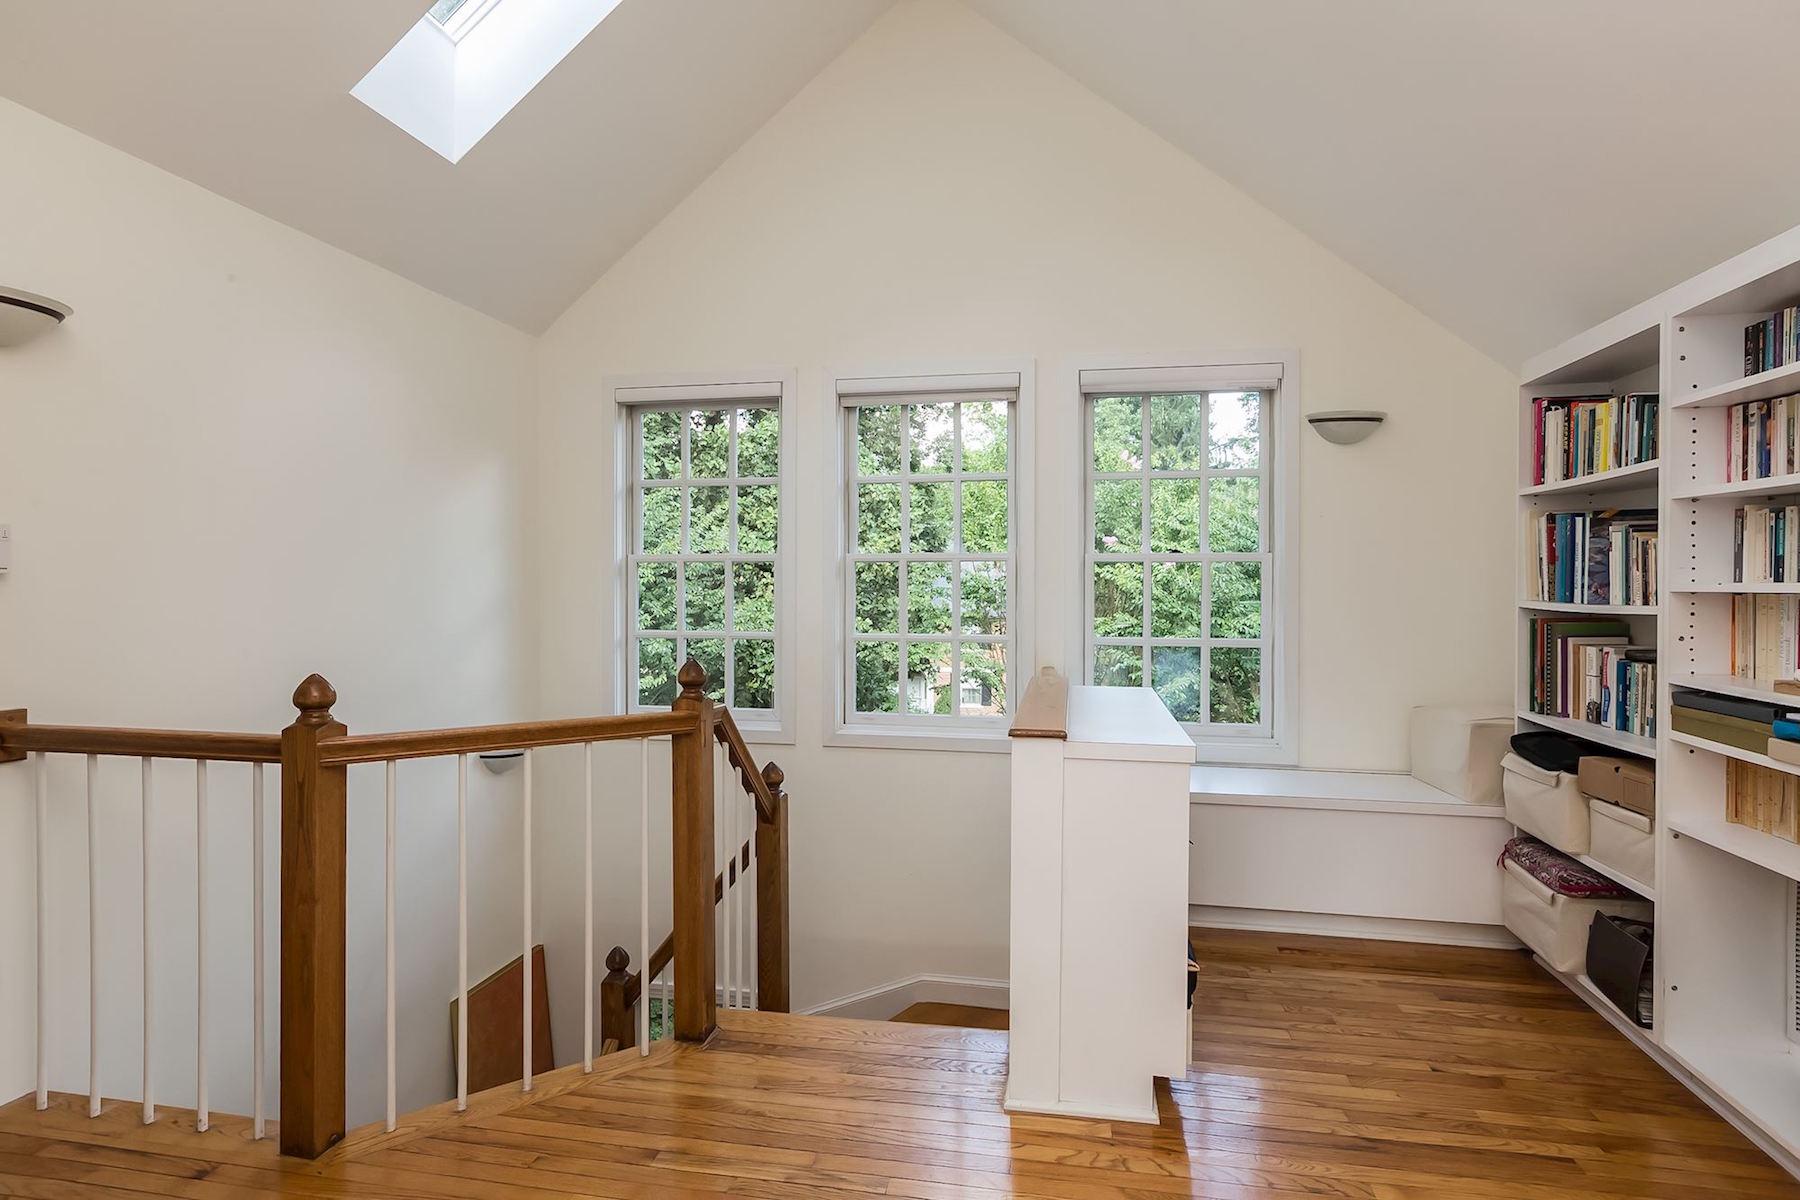 Additional photo for property listing at 5153 Tilden Street 5153 Tilden Street Nw 华盛顿市, 哥伦比亚特区 20016 美国